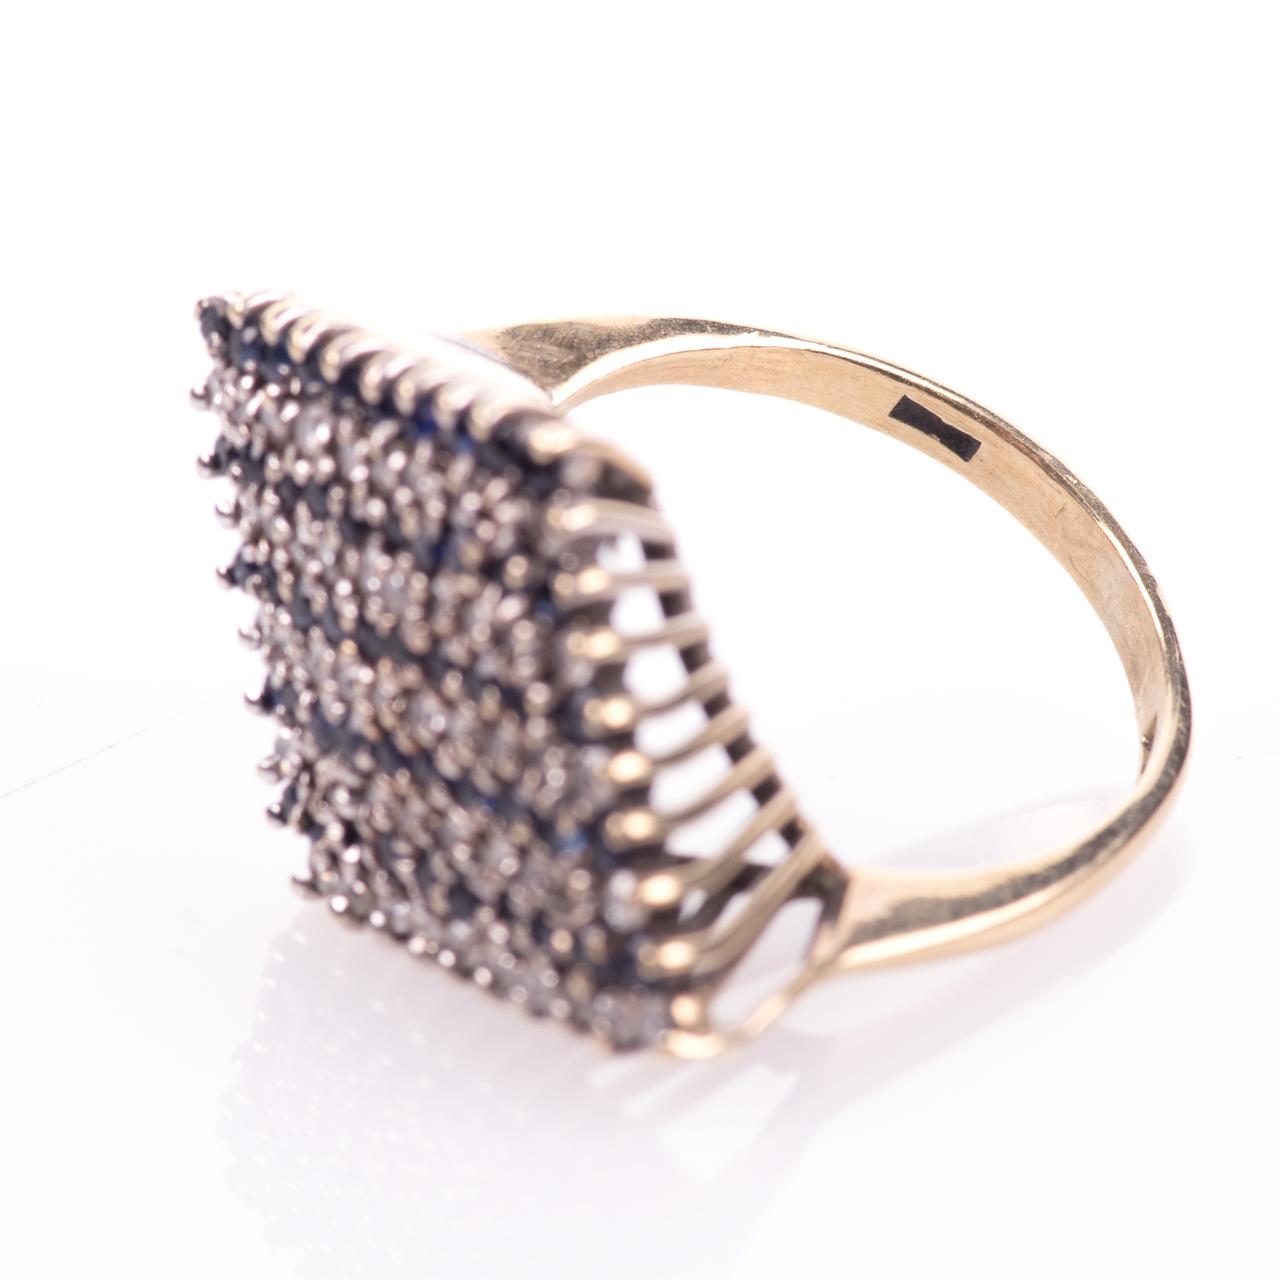 9ct Gold Sapphire & 0.50ct Diamond Ring Sheffield 1979 - Image 7 of 7